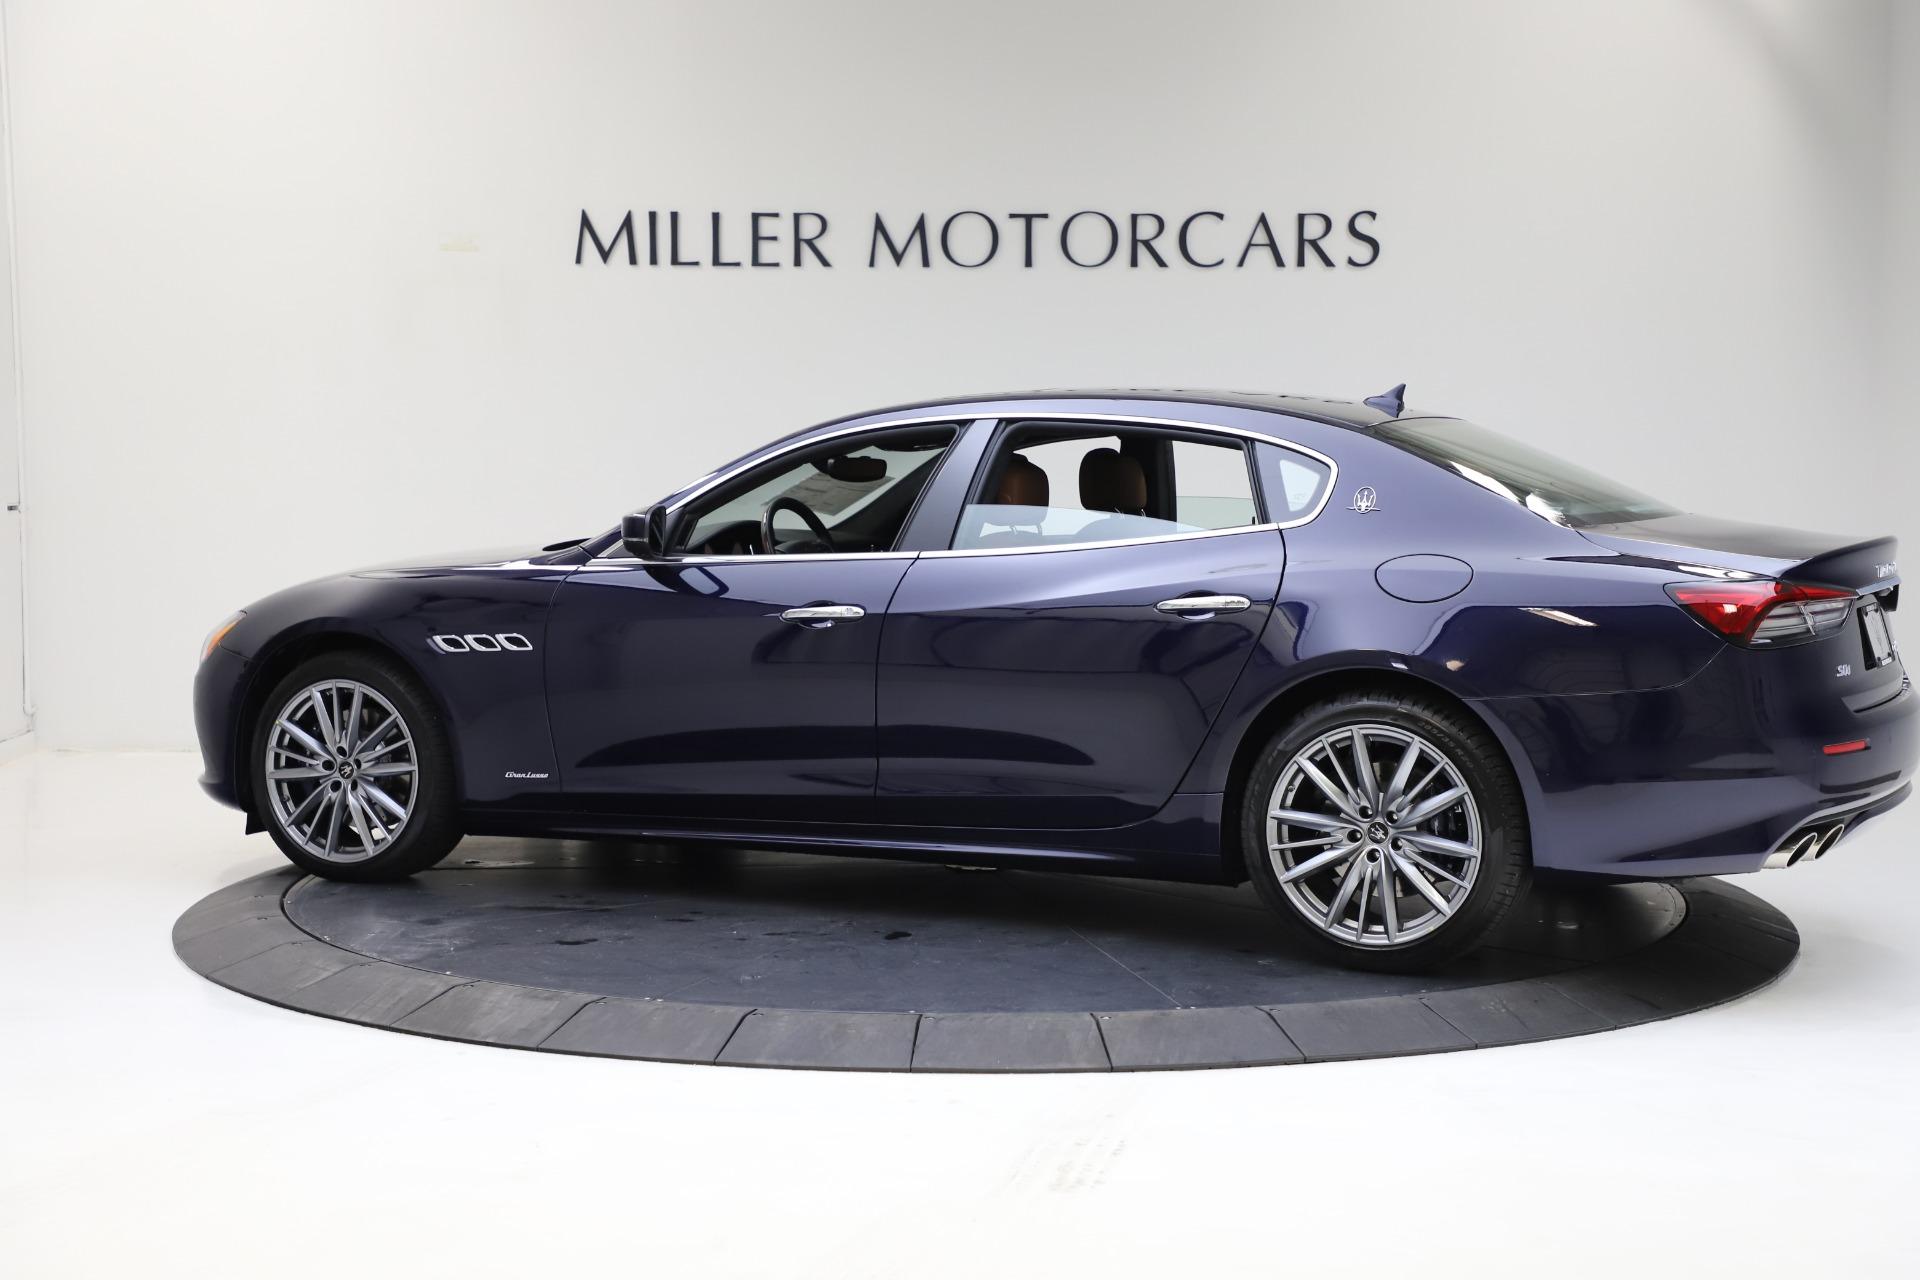 New 2021 Maserati Quattroporte S Q4 GranLusso